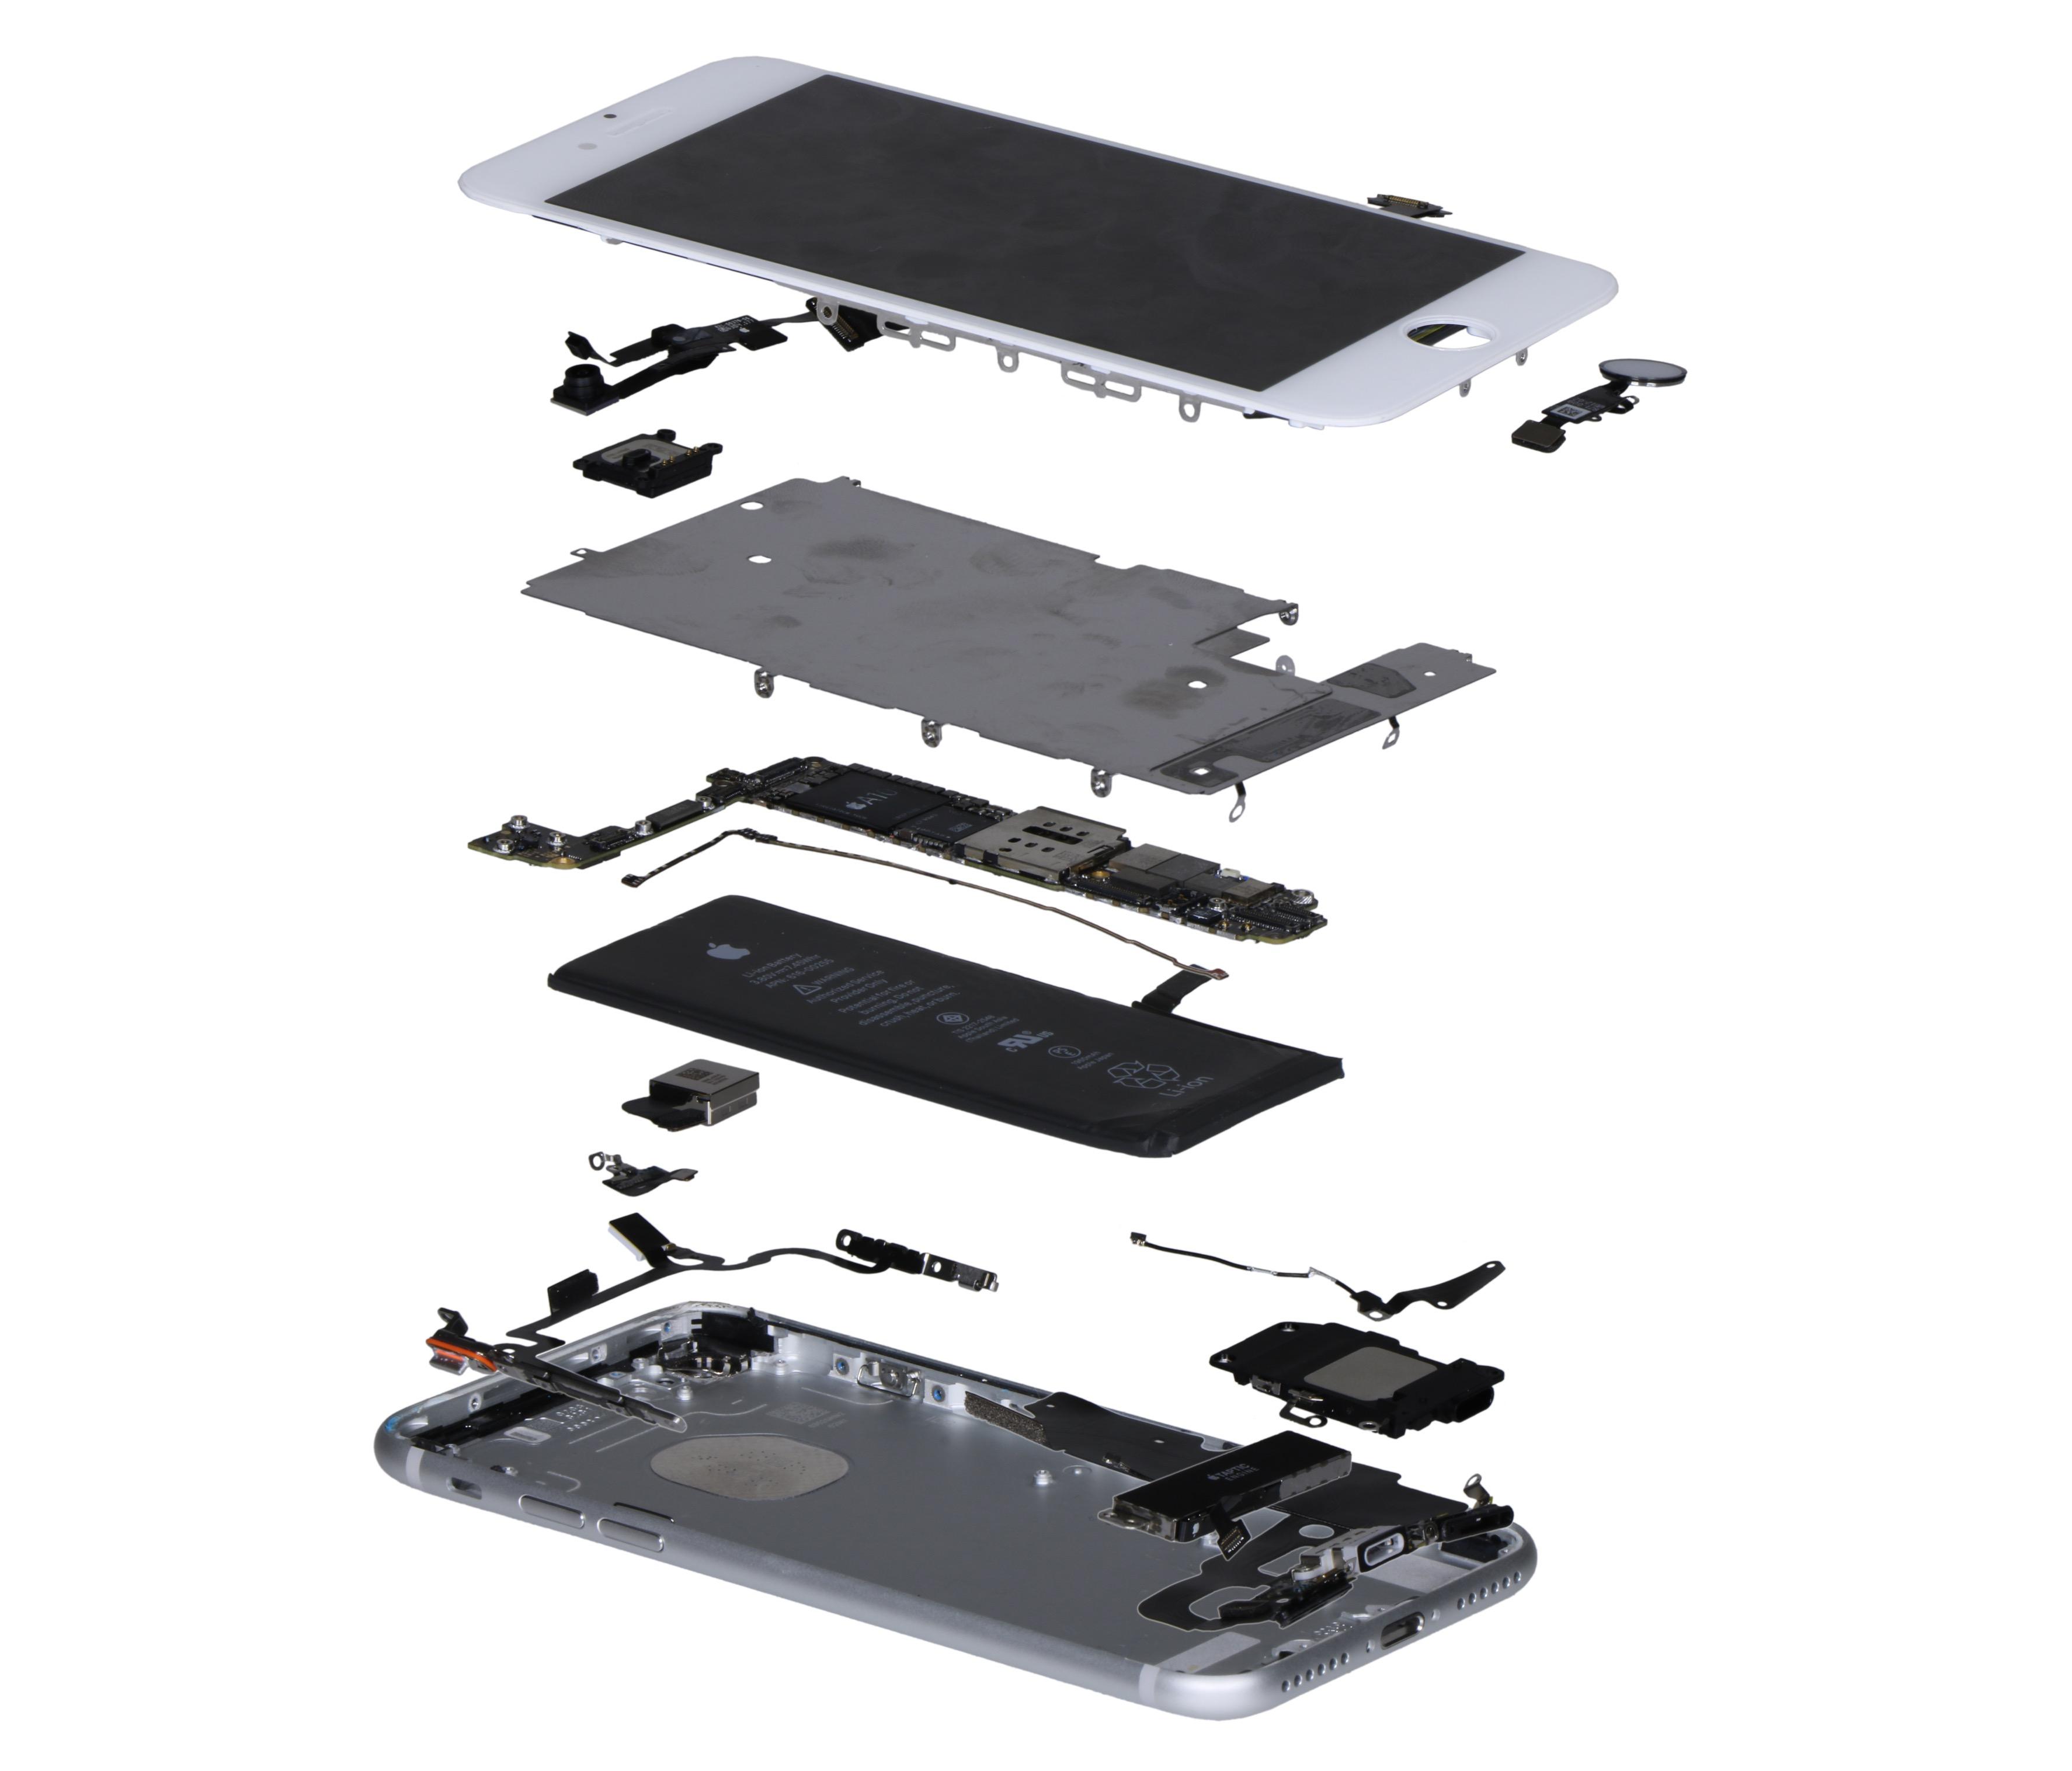 Componentes do iPhone 7